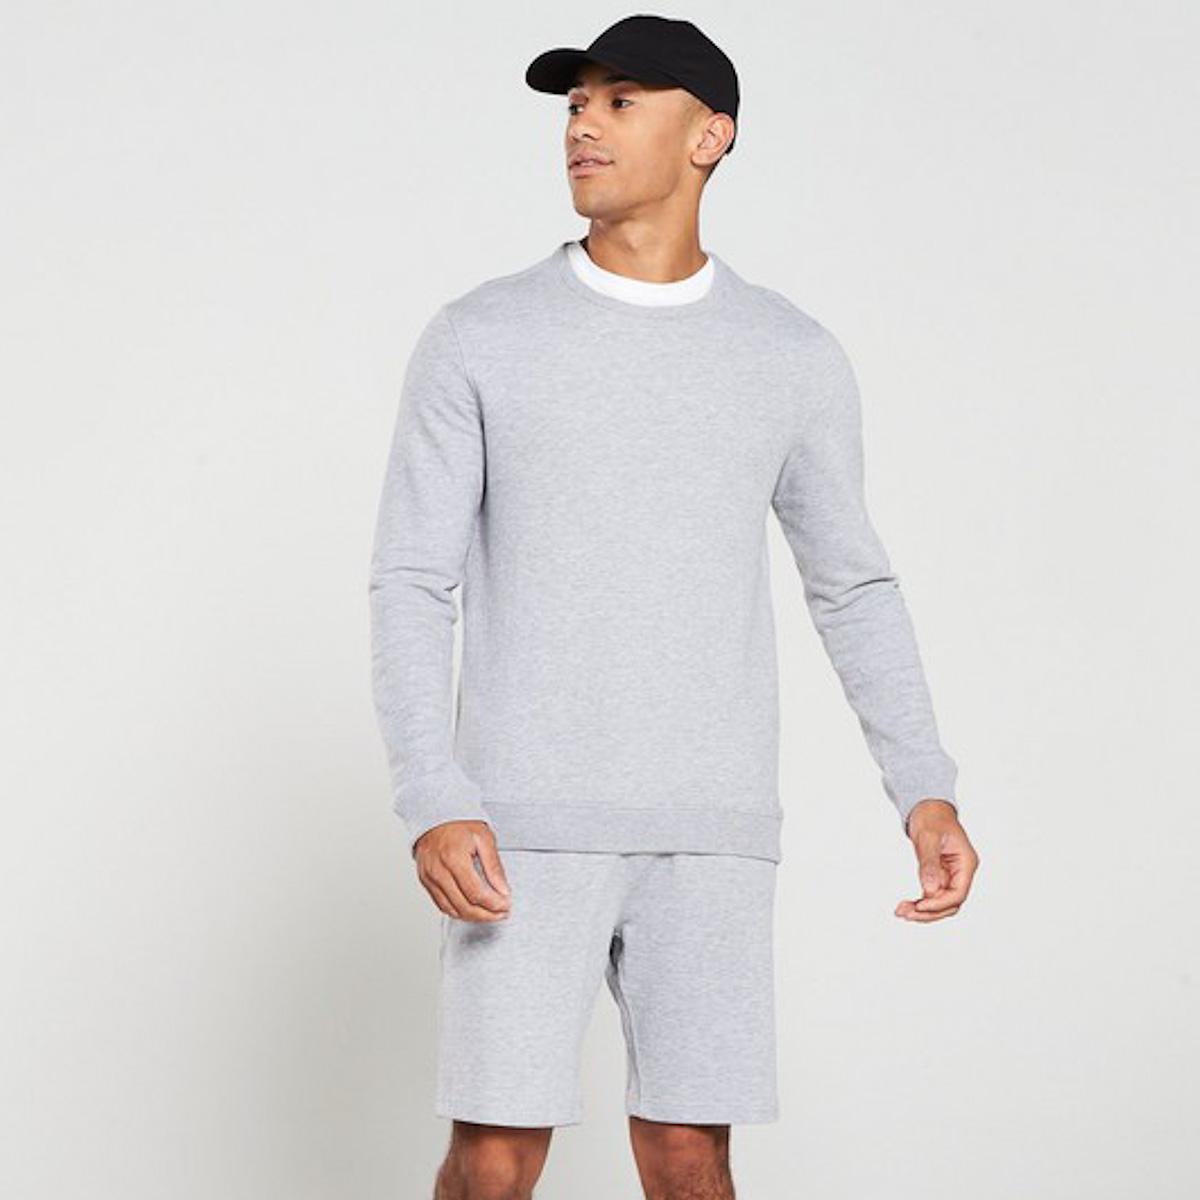 menswear-casualwear-very-summer-staples-2020-man-for-himself